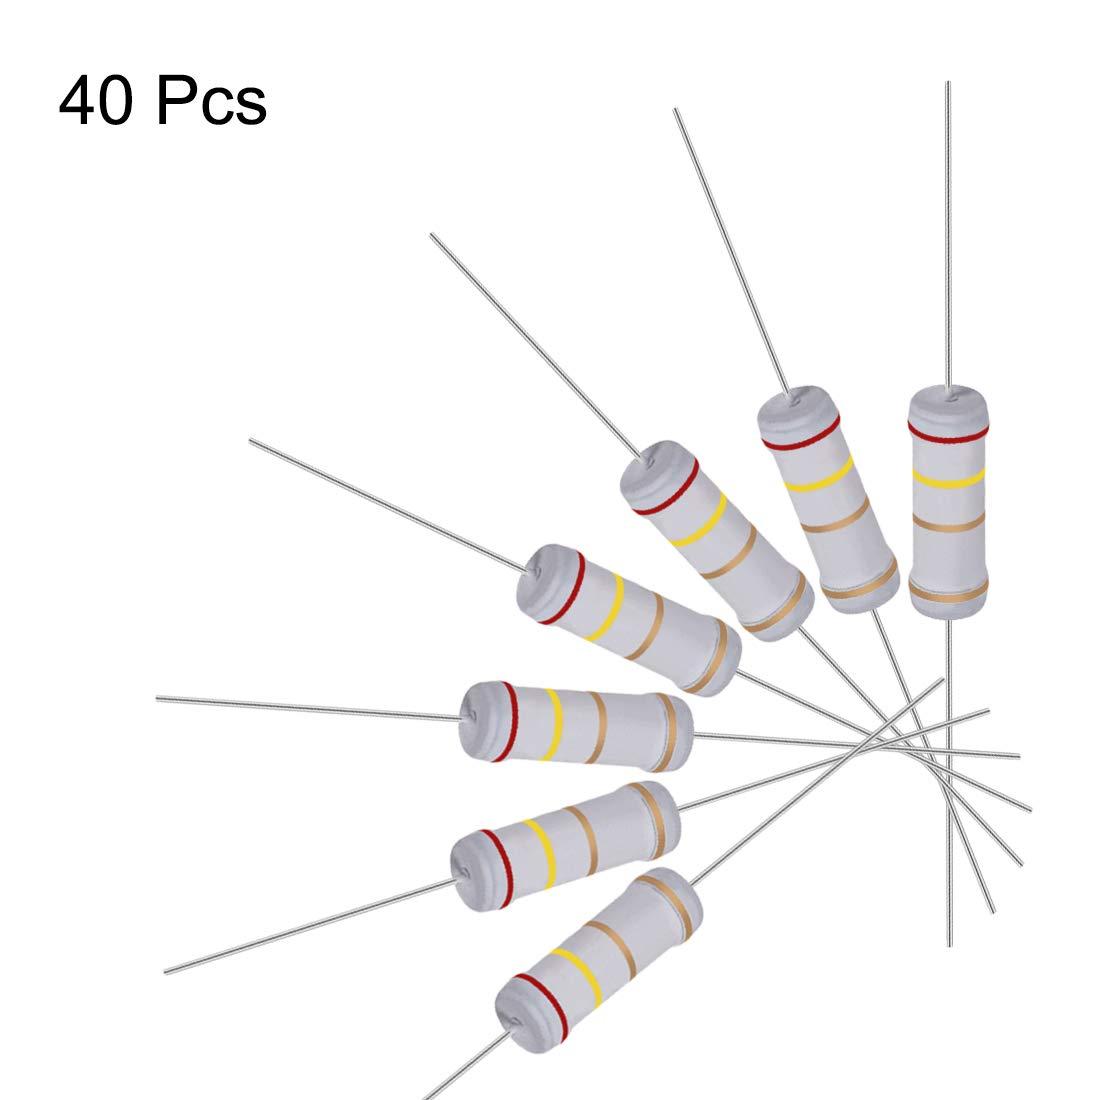 3 W, /± 5/% de tolerancia 1.3 ohm 20pcs Resistor de pel/ícula de /óxido de metal Sourcingmap